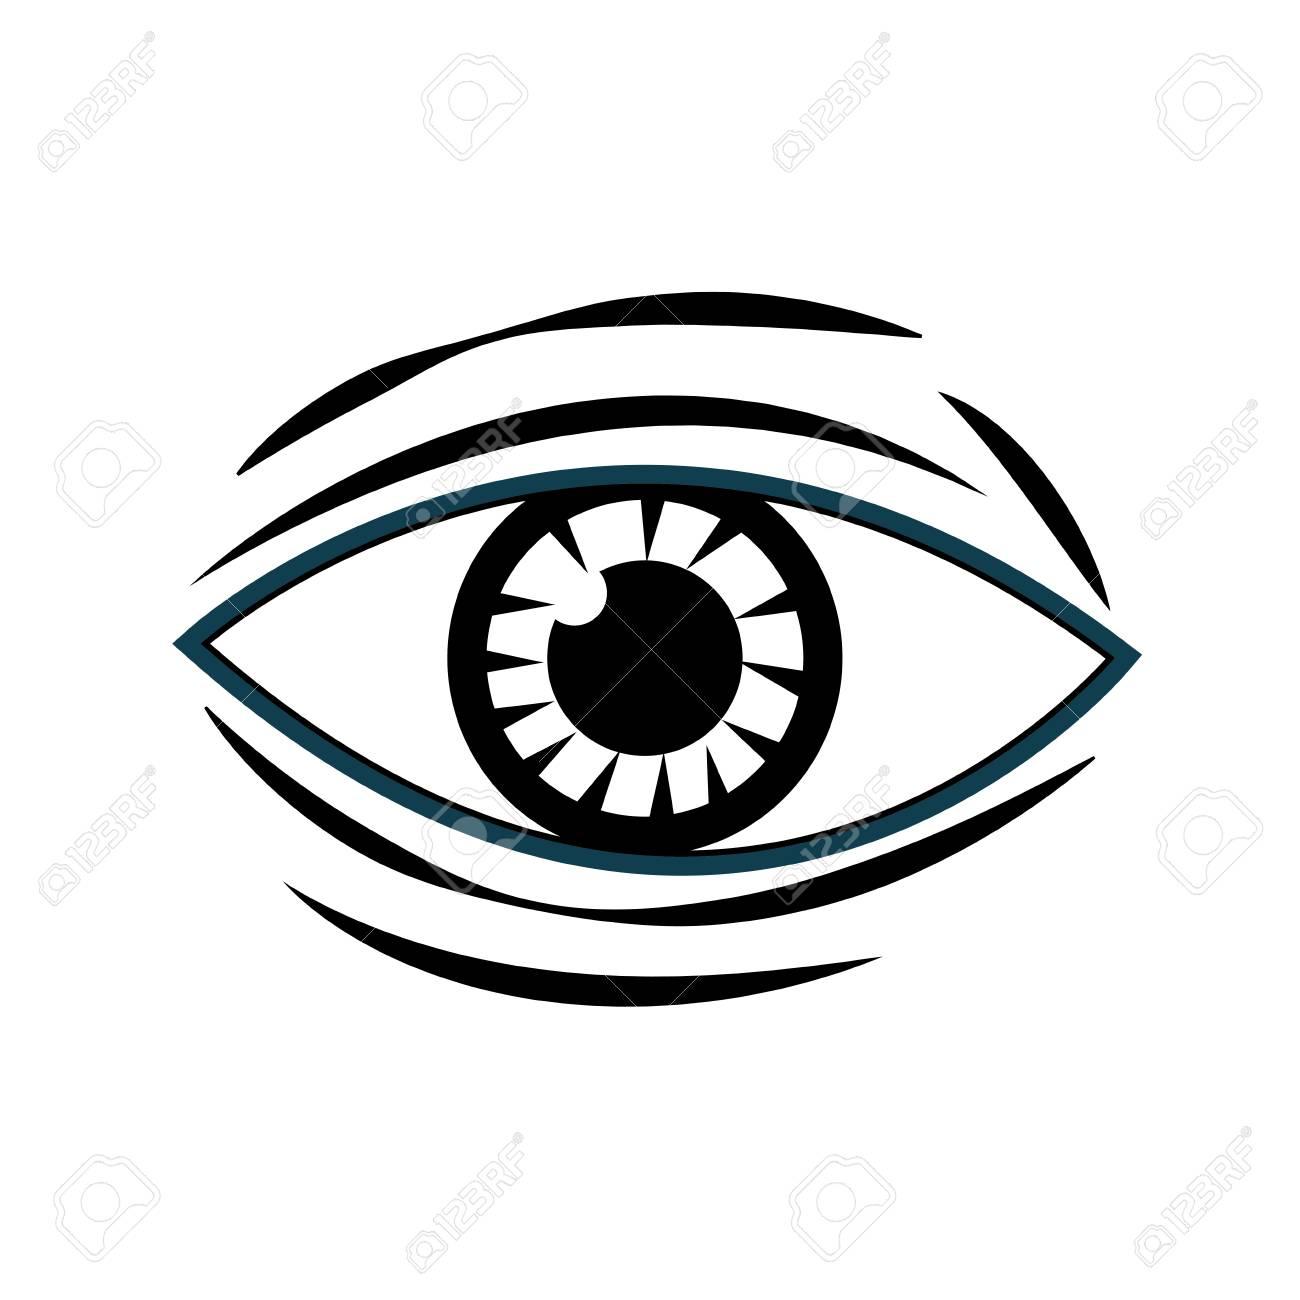 5f490ed19e9 human eye vision optical design image vector illustration Stock Vector -  78656054